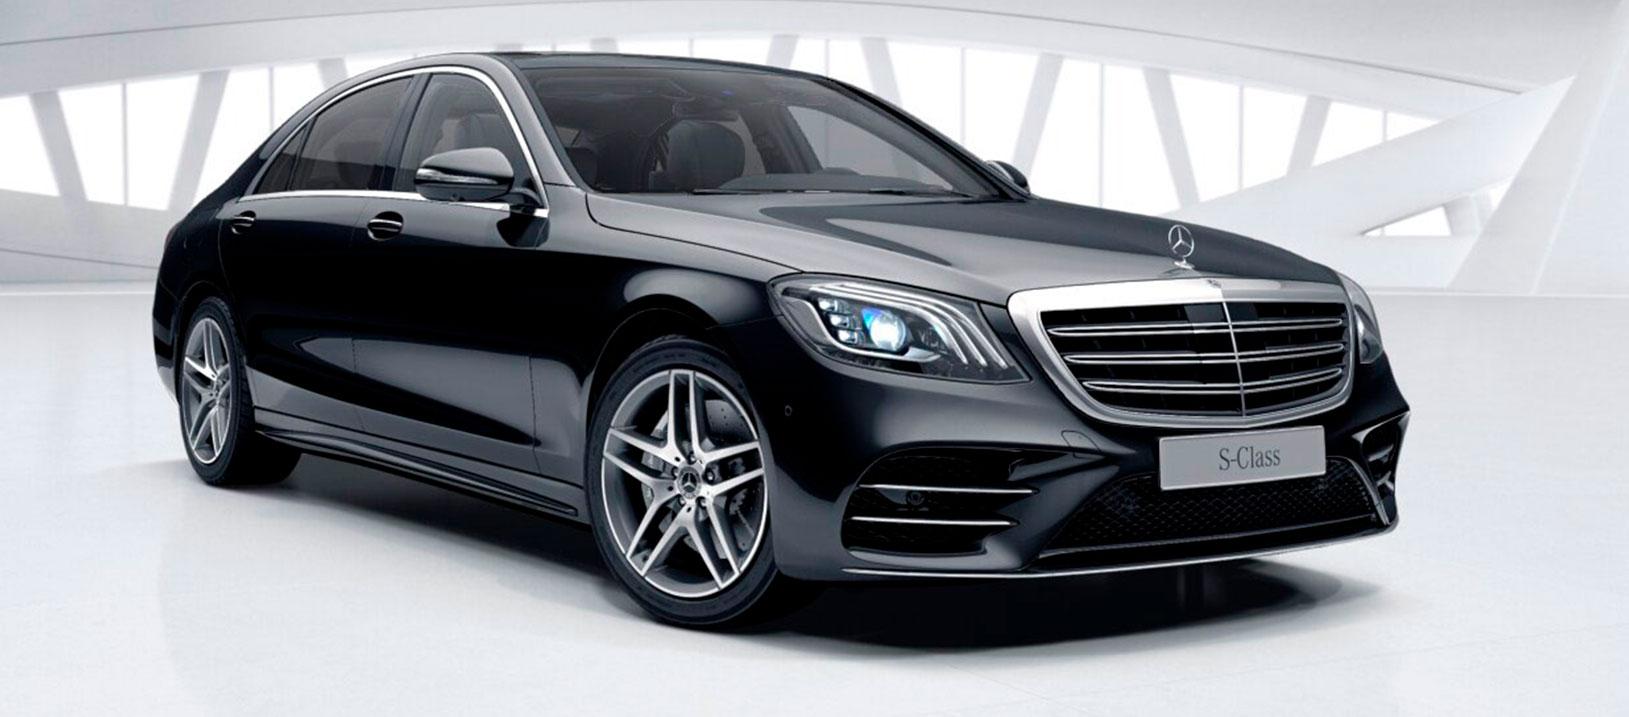 Mercedes-Benz S 400 d 4MATIC long 52600178